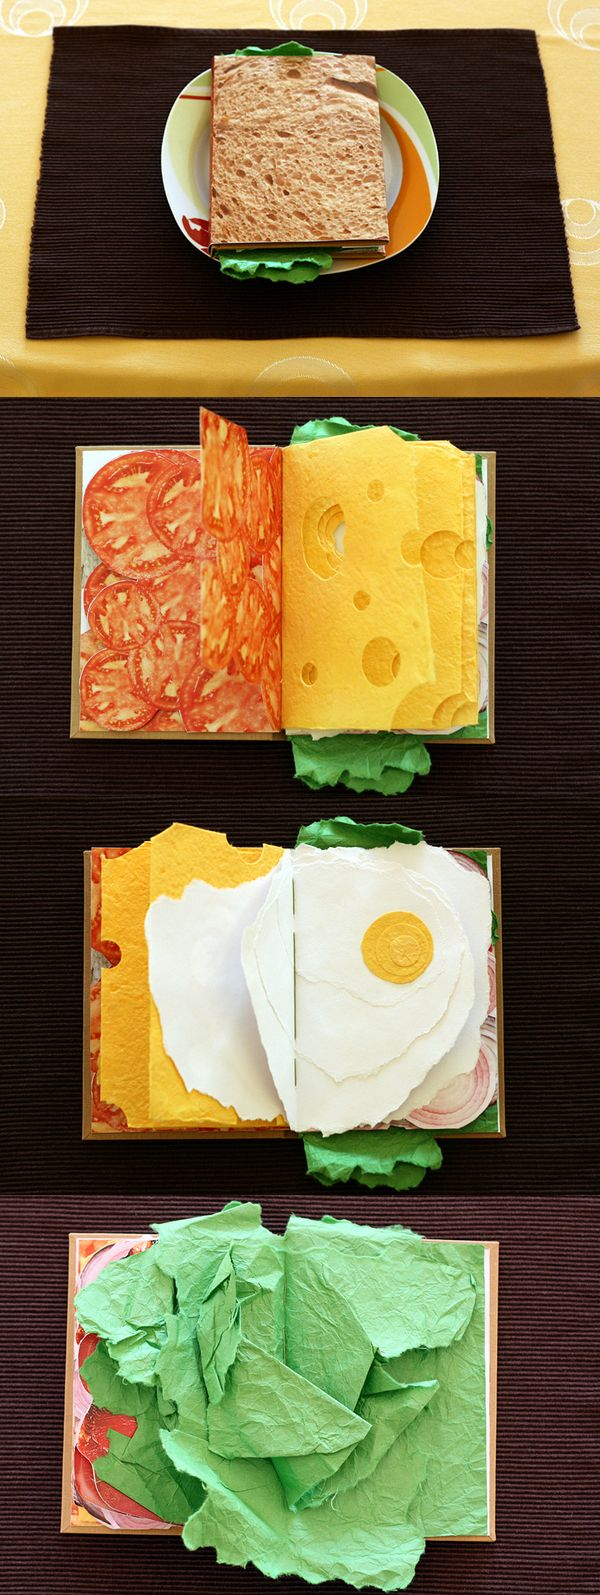 Sandwich Book by Pawel Piotrowski. 16 Creative Packaging Examples. #packaging